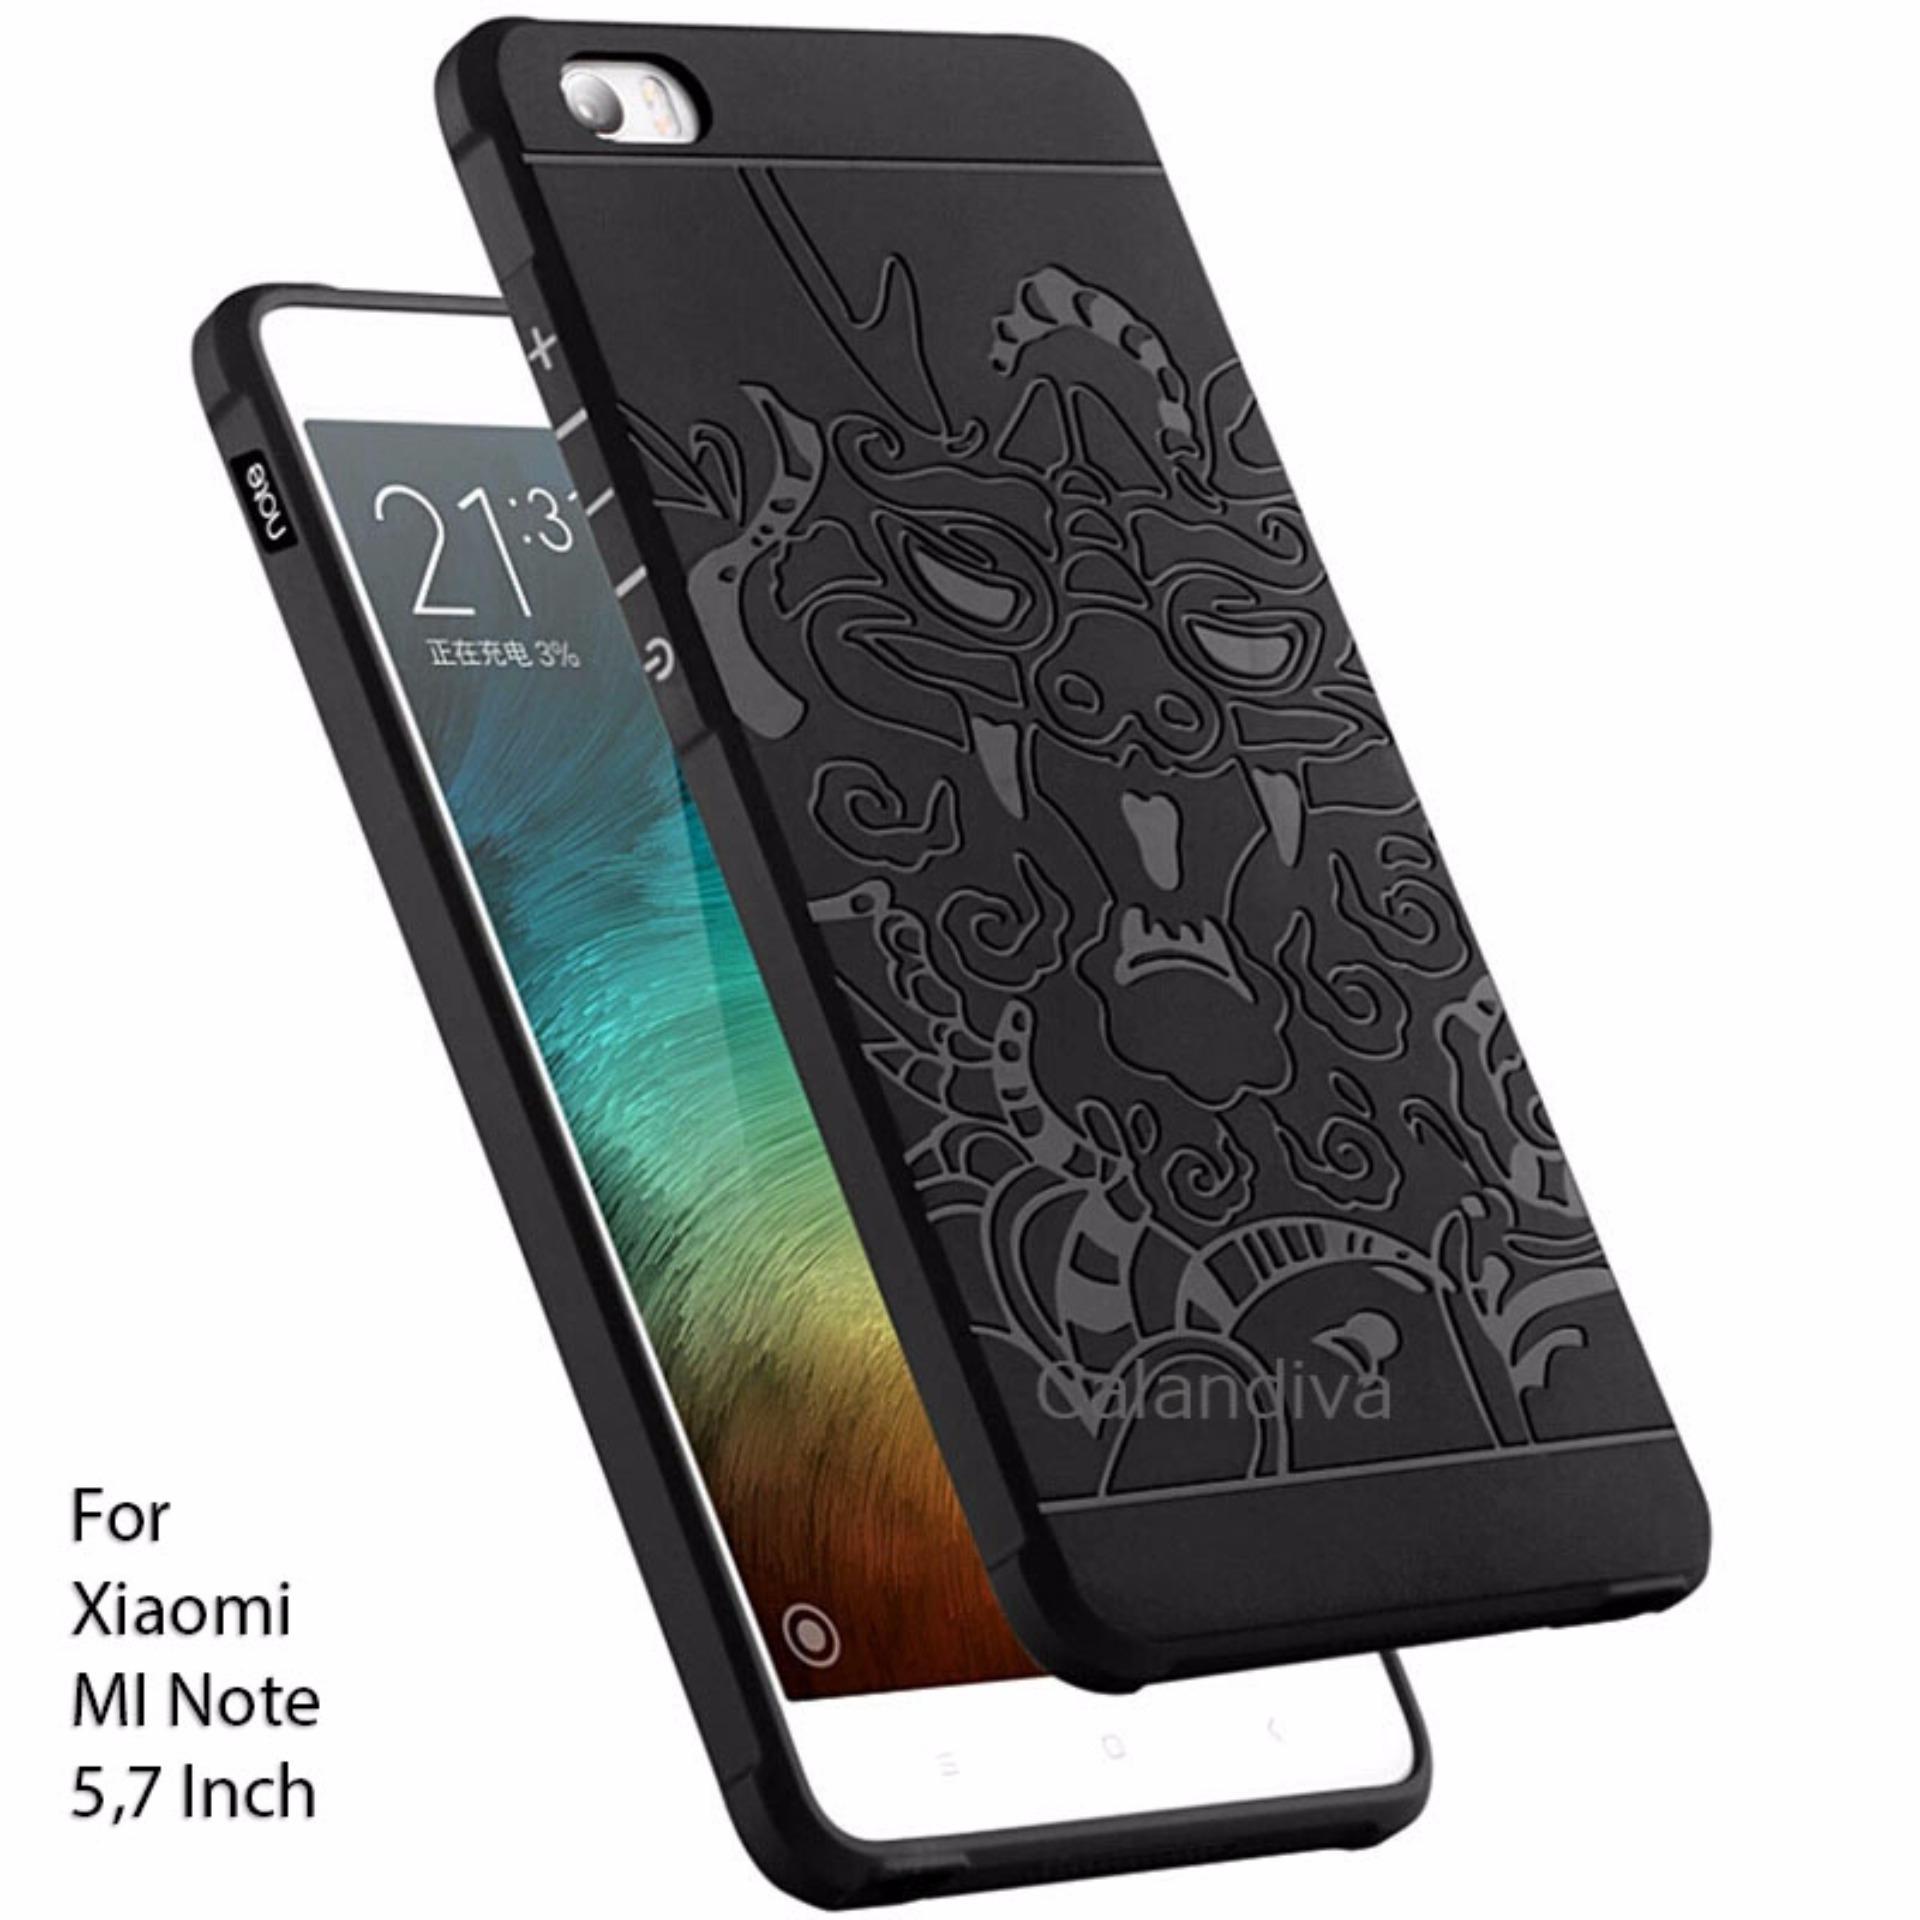 Calandiva Dragon Shockproof Hybrid Case for Xiaomi Mi Note / Pro 5.7 inch .